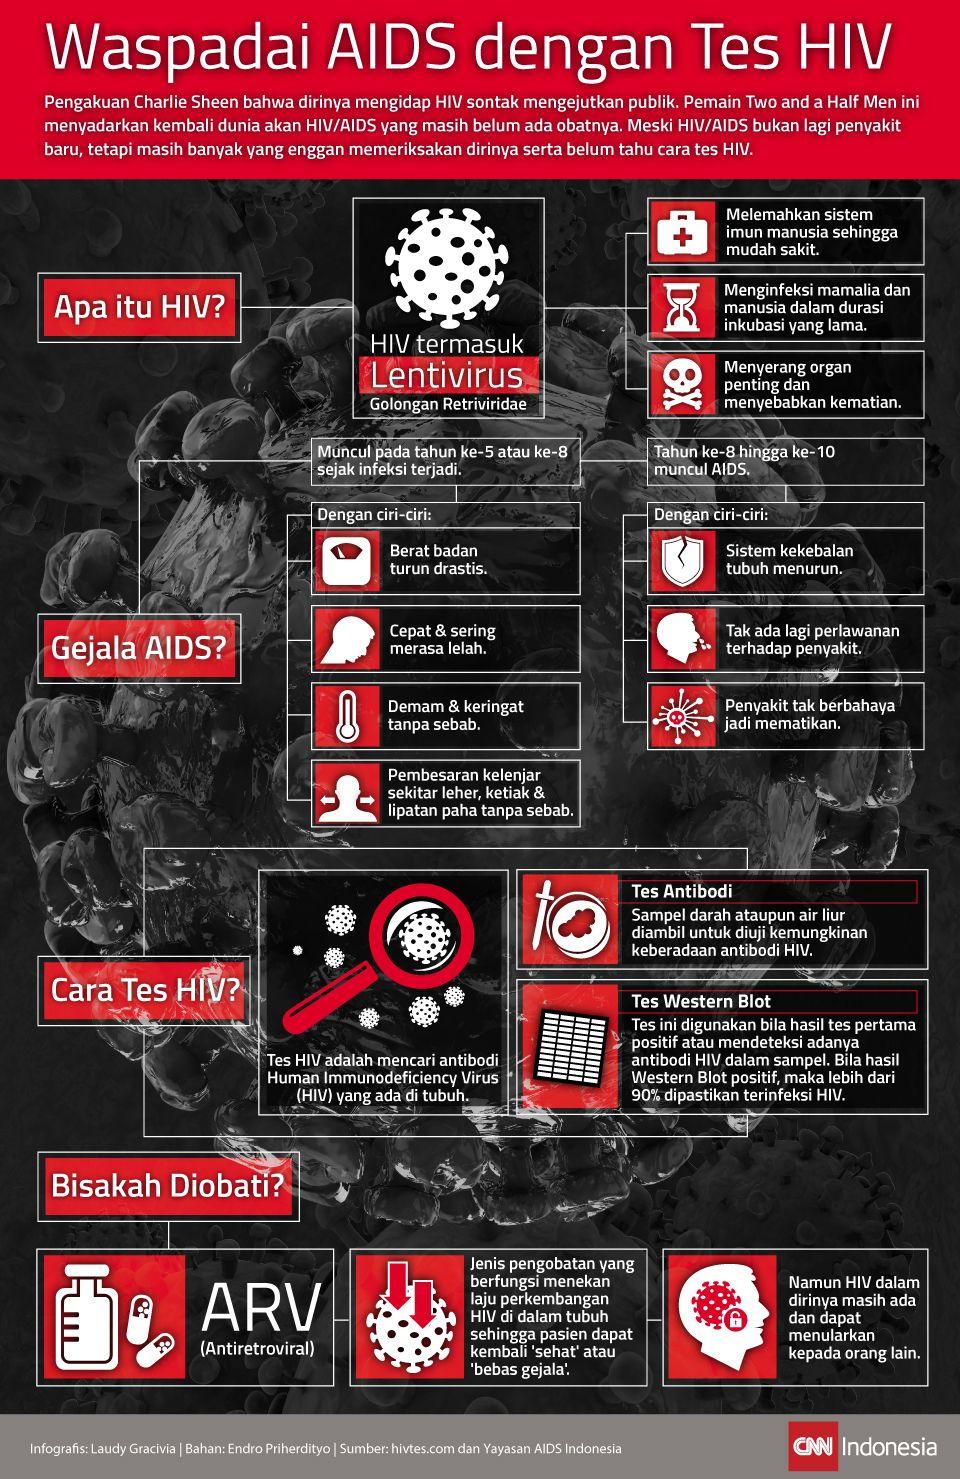 Infografis Waspadai AIDS dengan Tes HIV